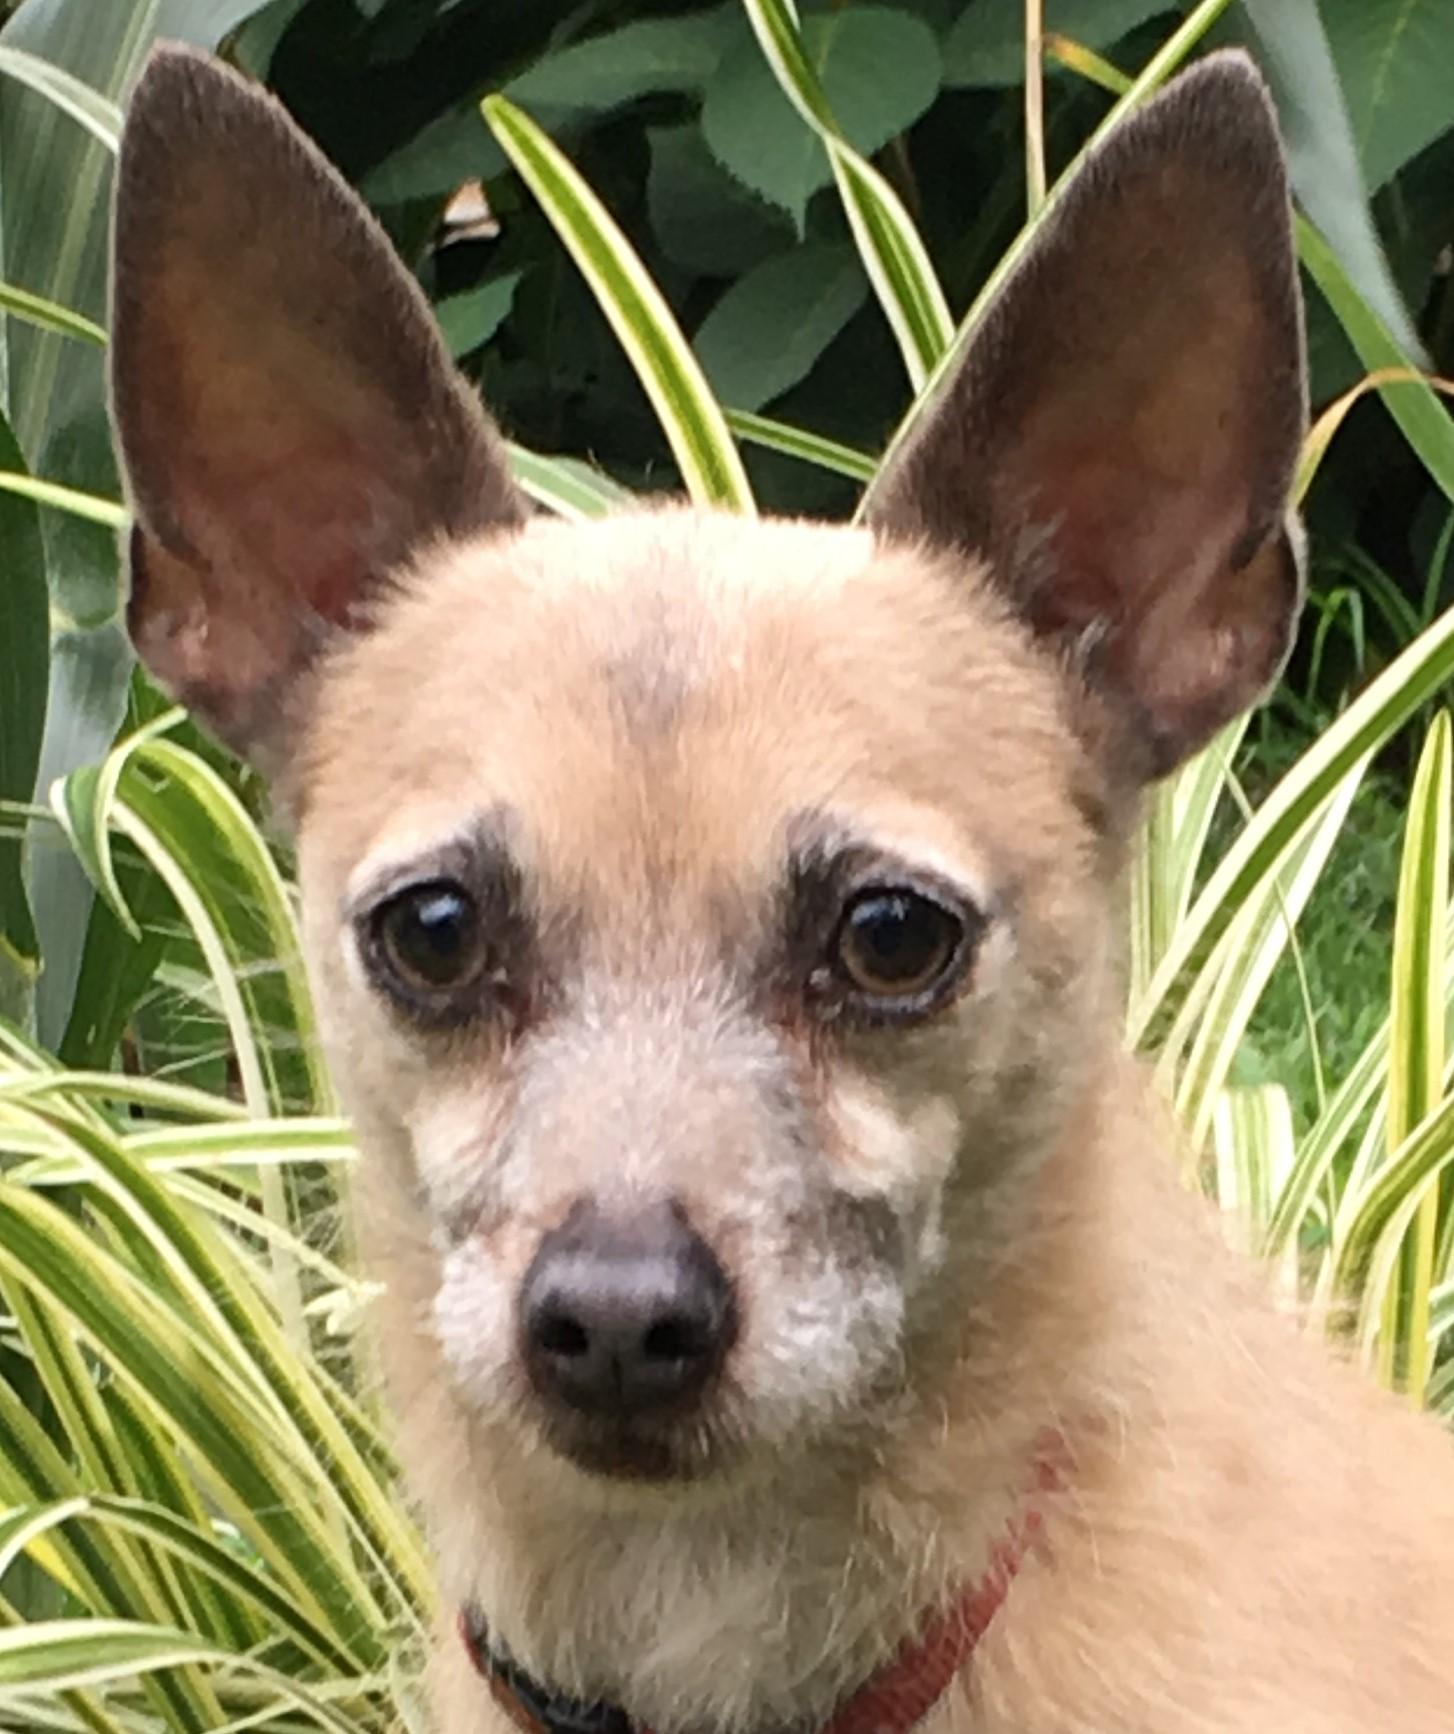 Chihuahua_Frankie_Head_Shot.JPG